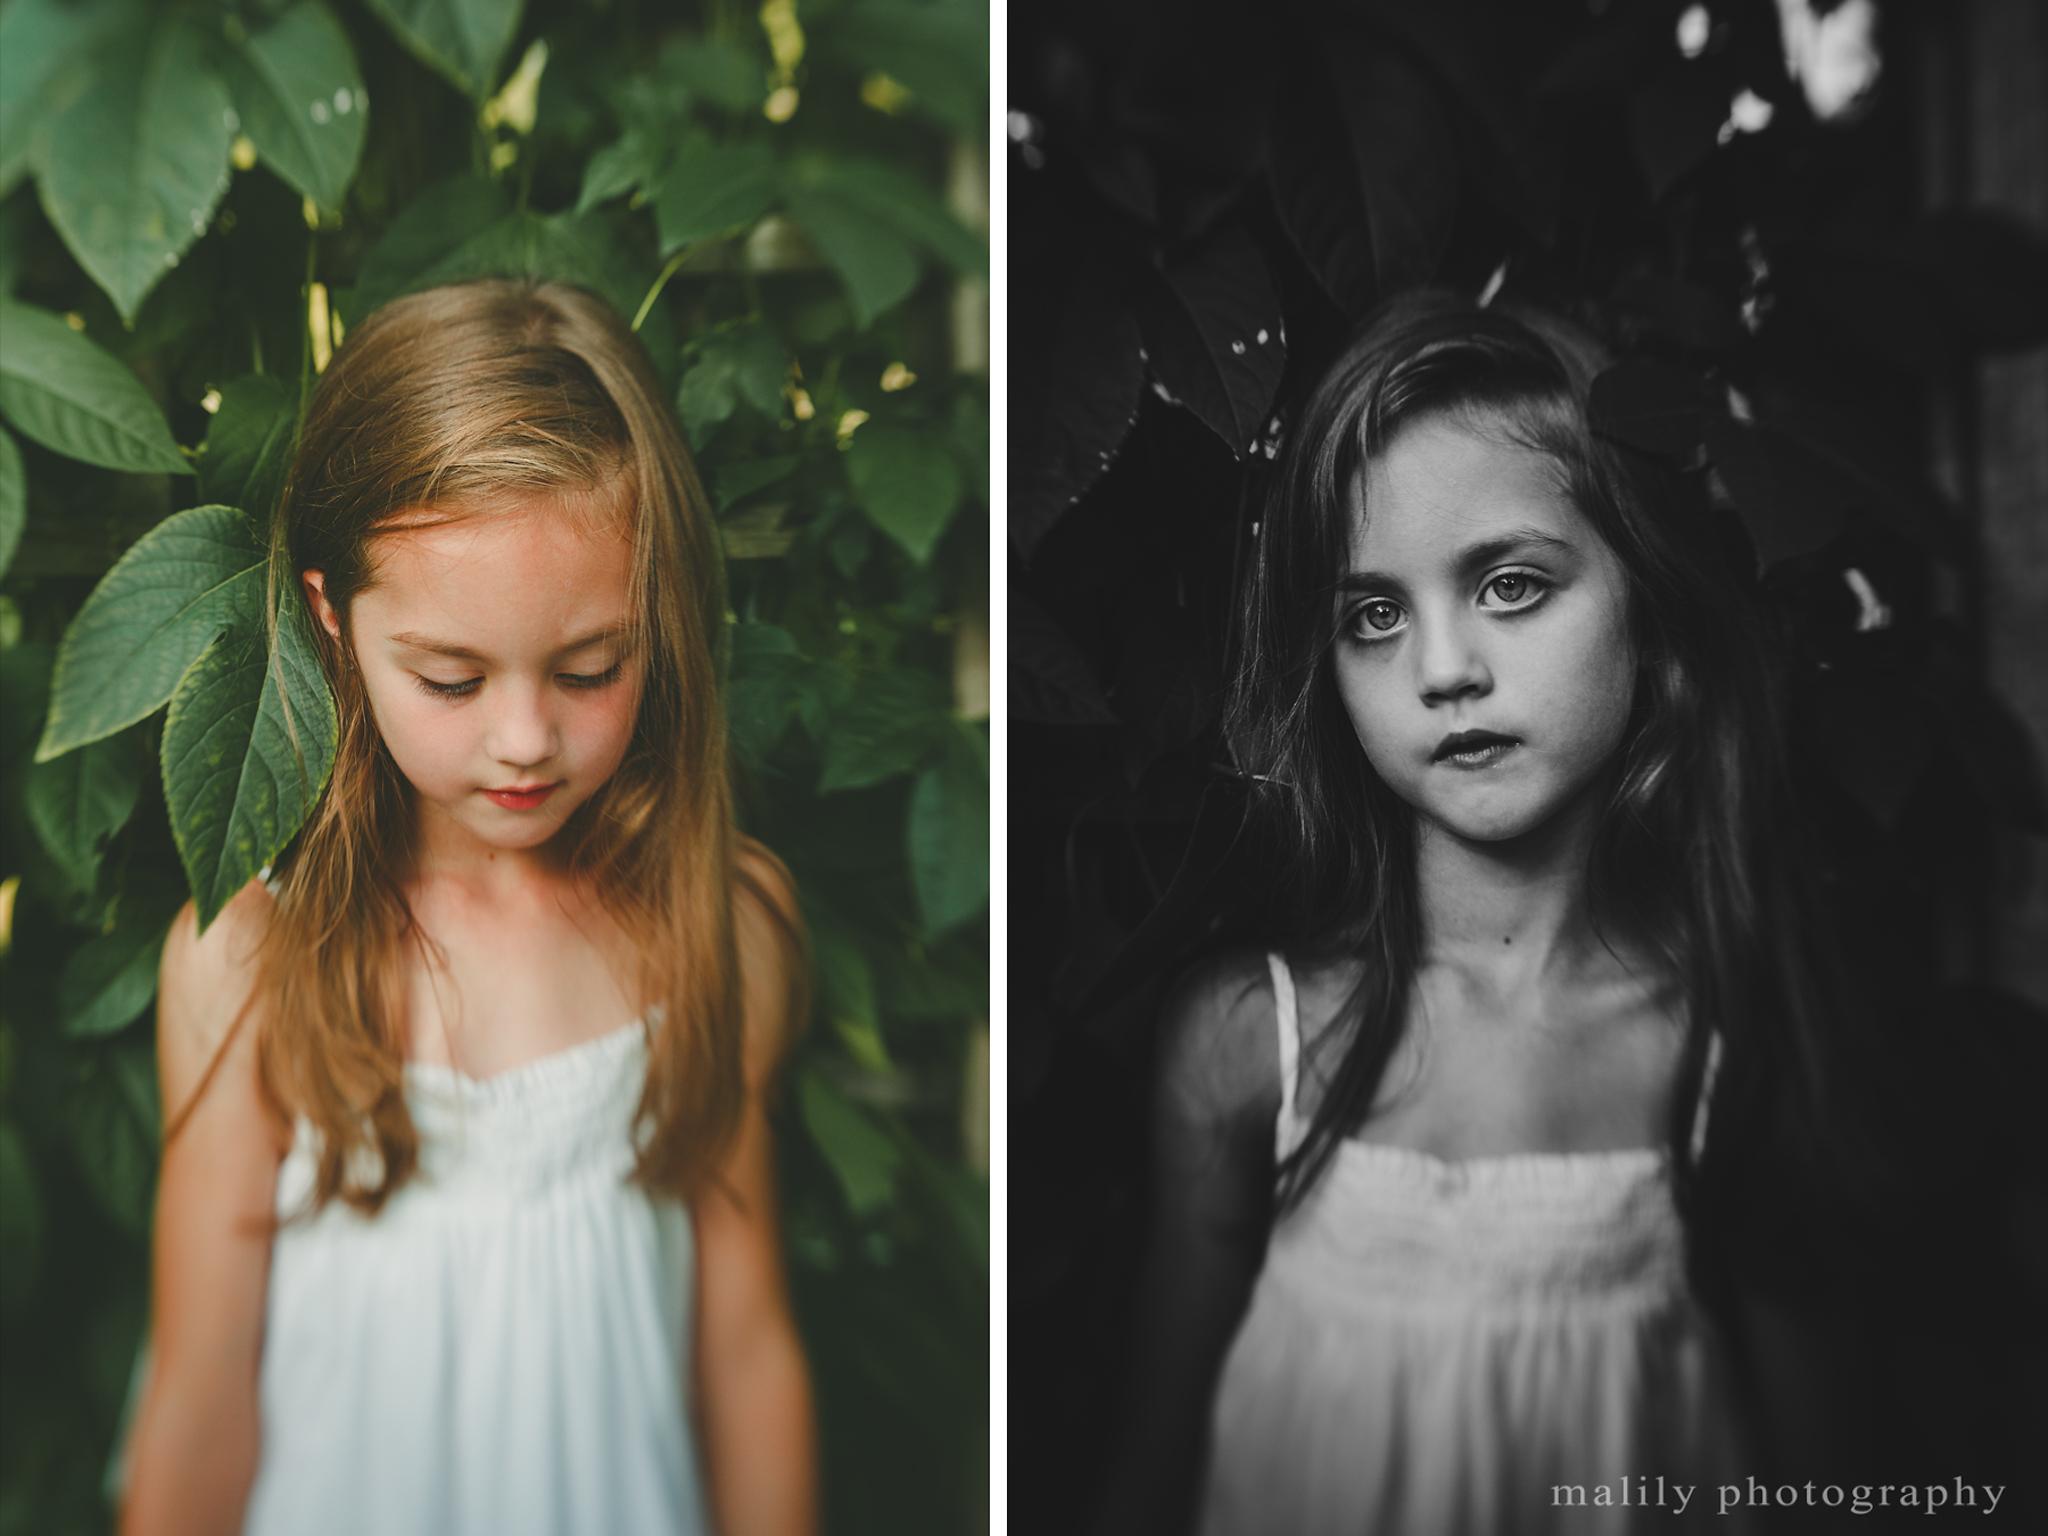 malily photography   pine grove, pa child photography